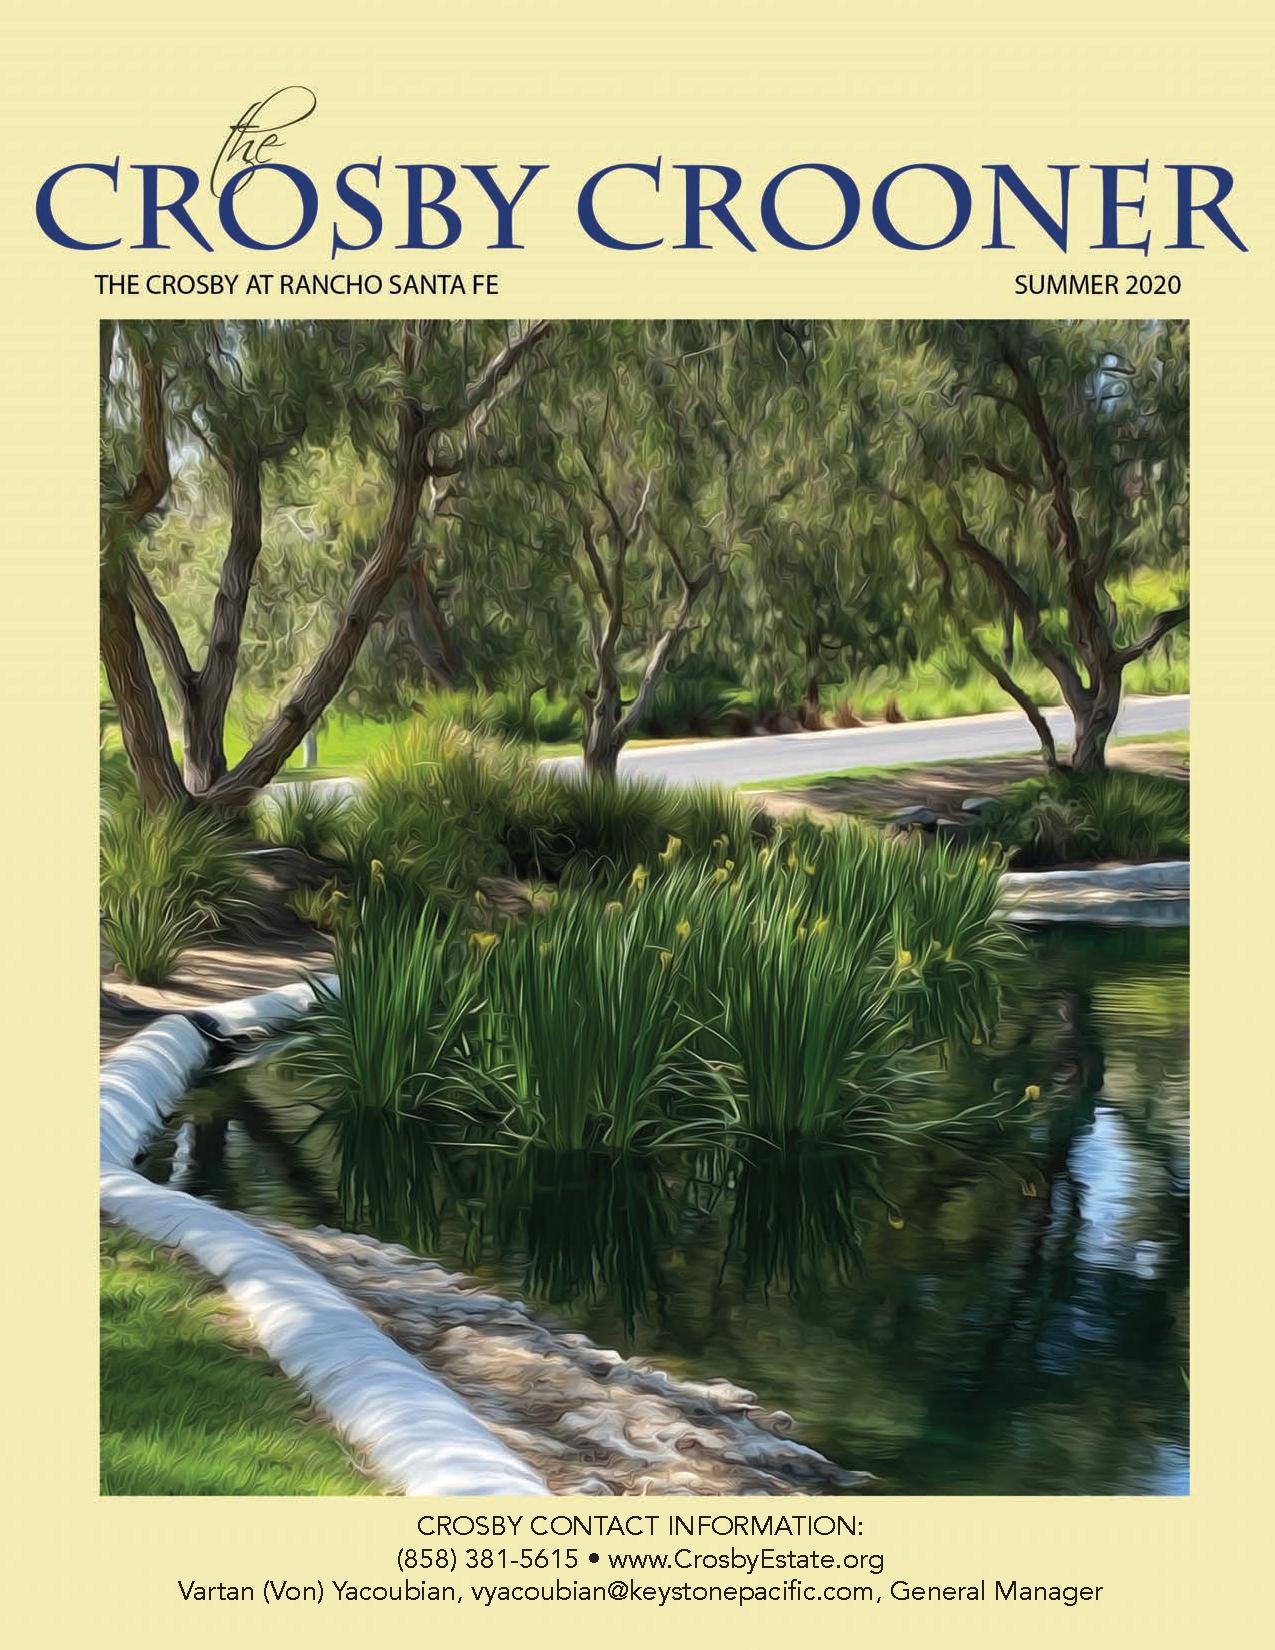 Summer 2020 Crosby Crooner Cover